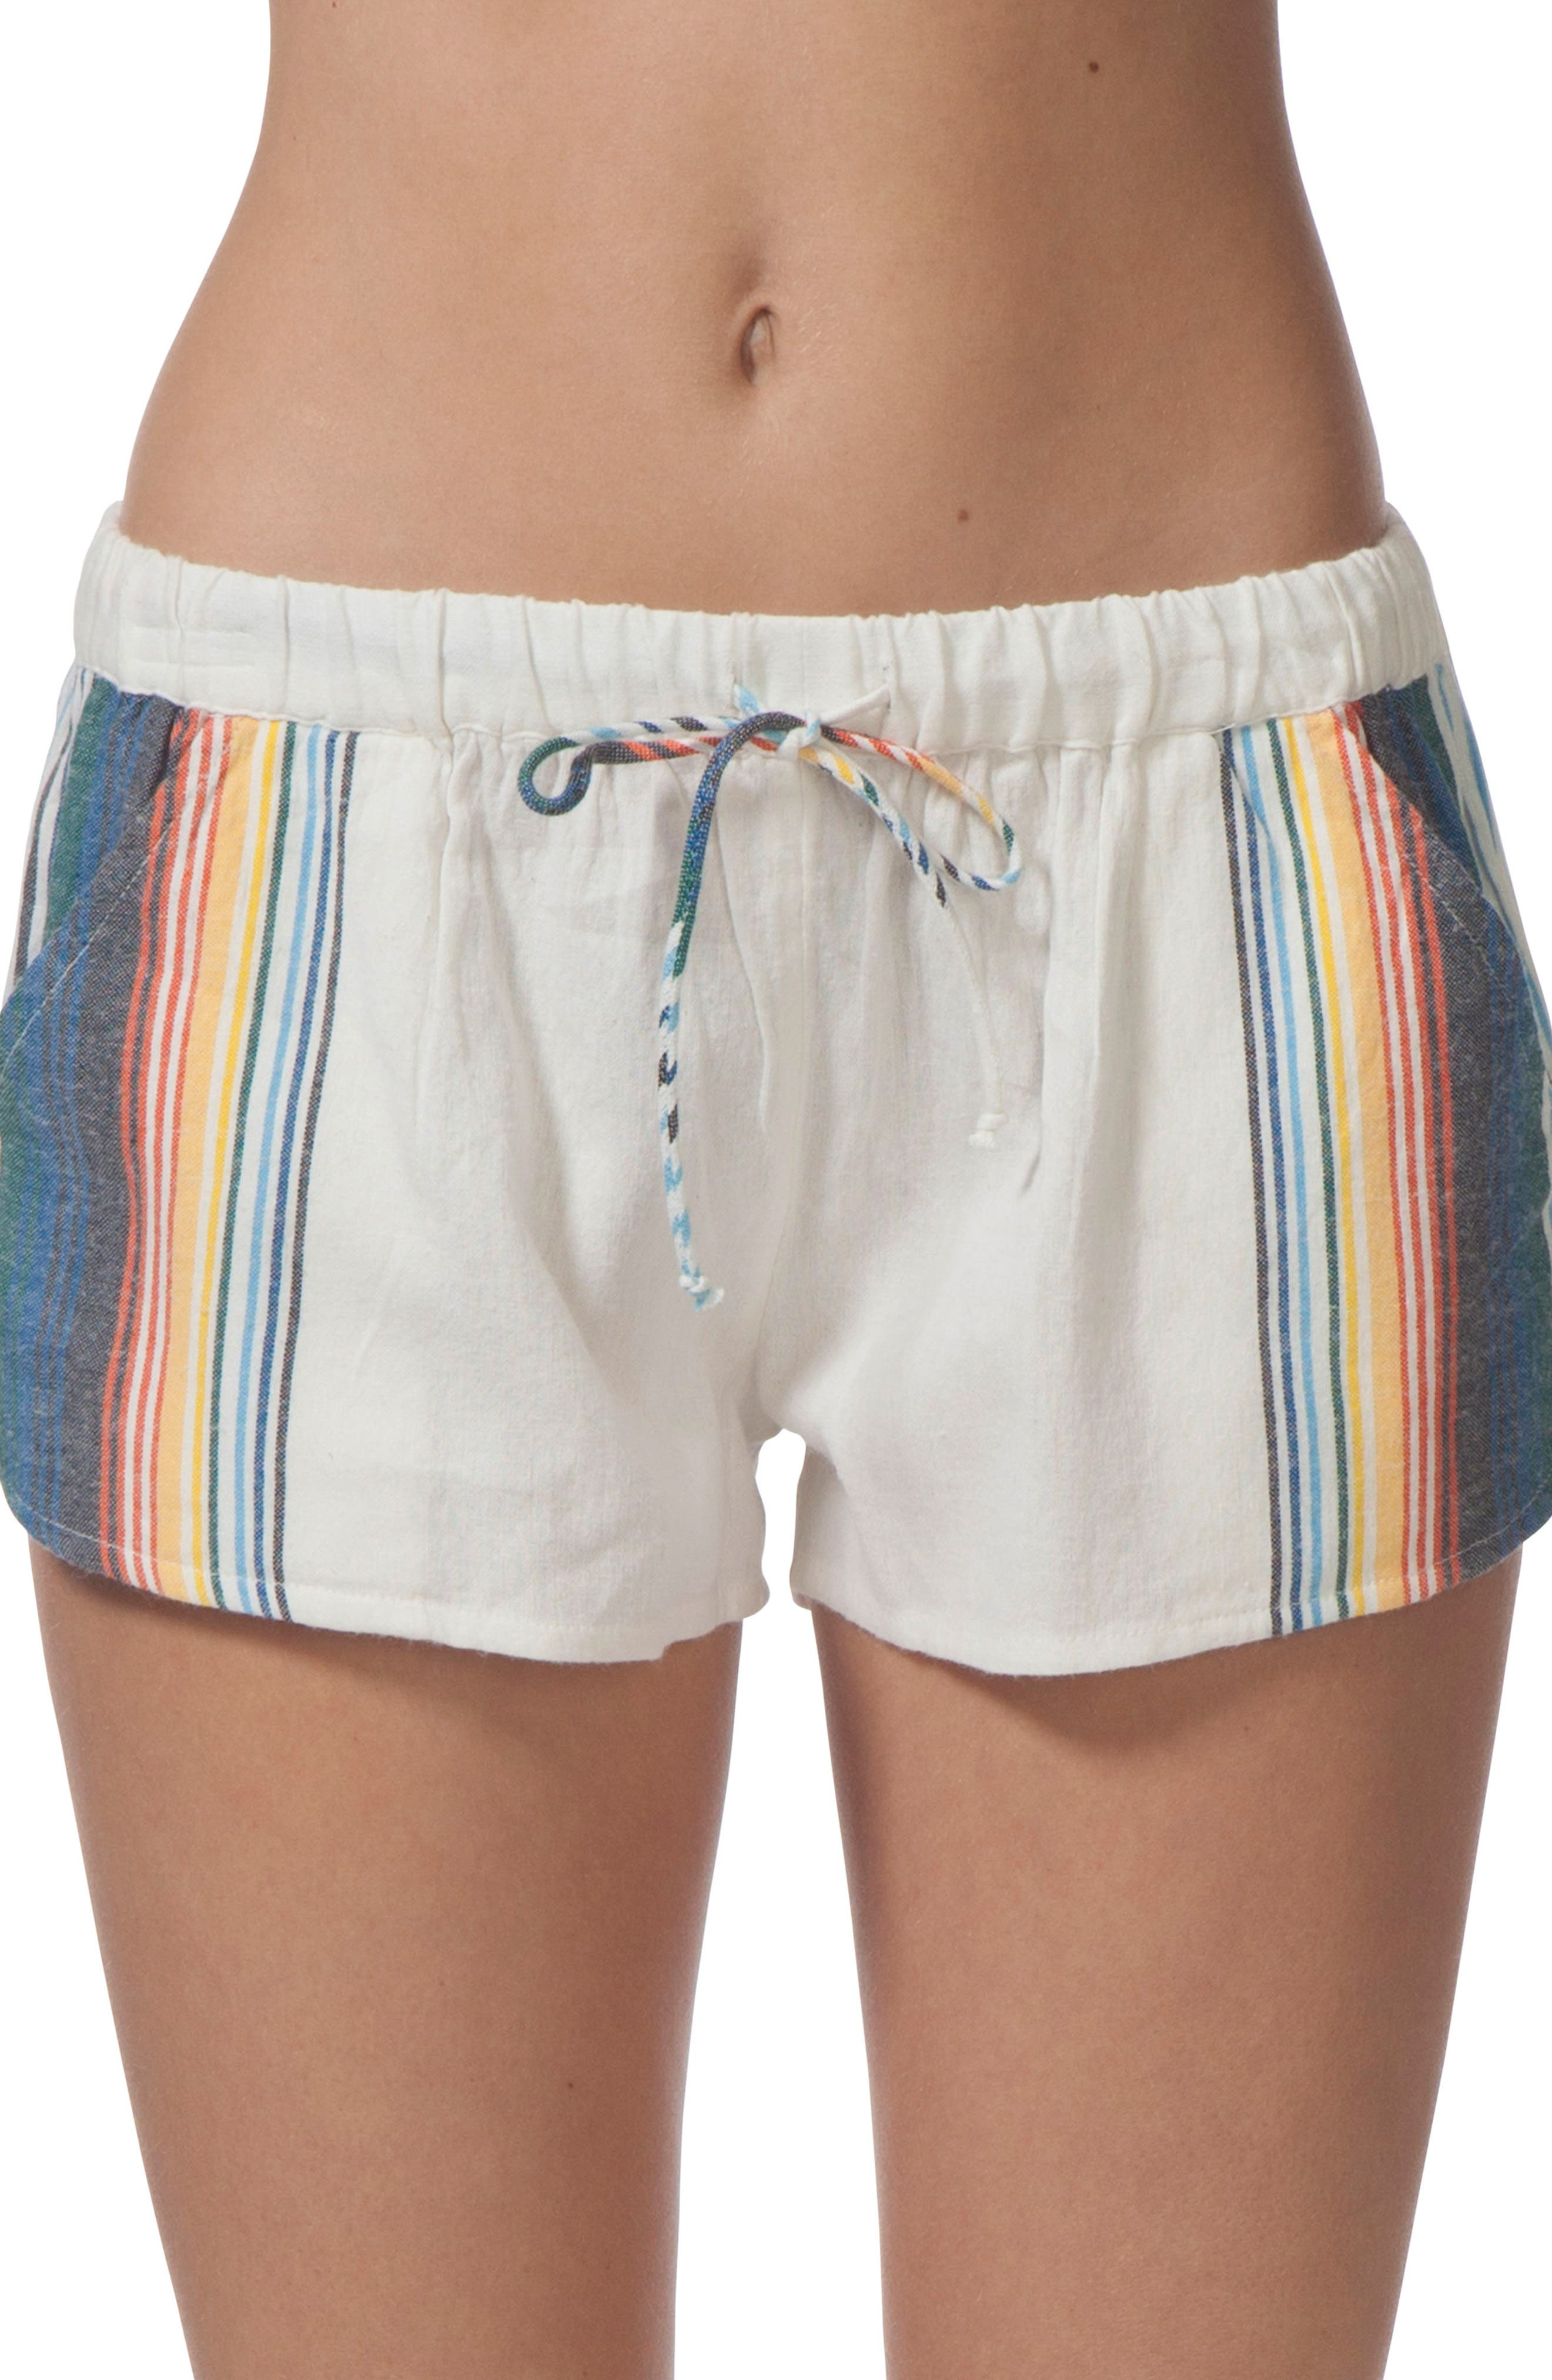 Beach Bazaar Cotton Shorts,                             Main thumbnail 1, color,                             111